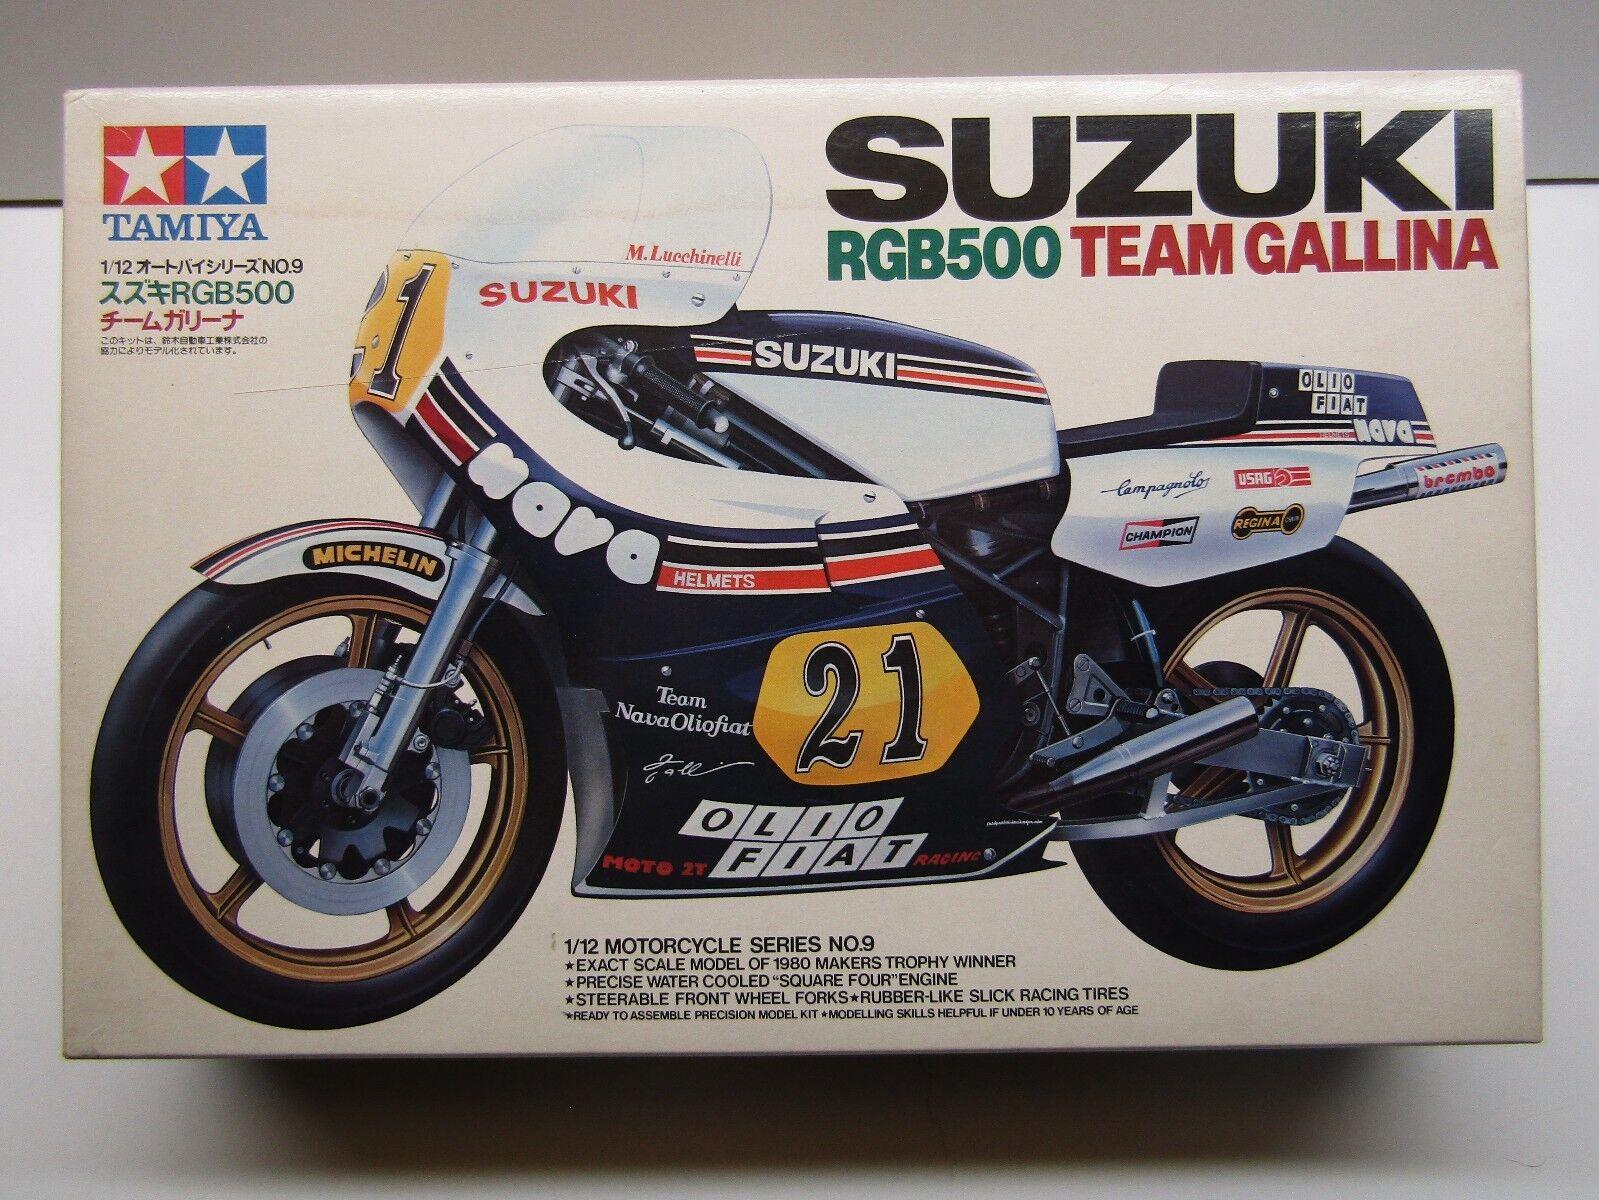 Tamiya Vintage 1 12 Scale Suzuki RGB500 Team Gallina GP Racer Model Kit New 1409